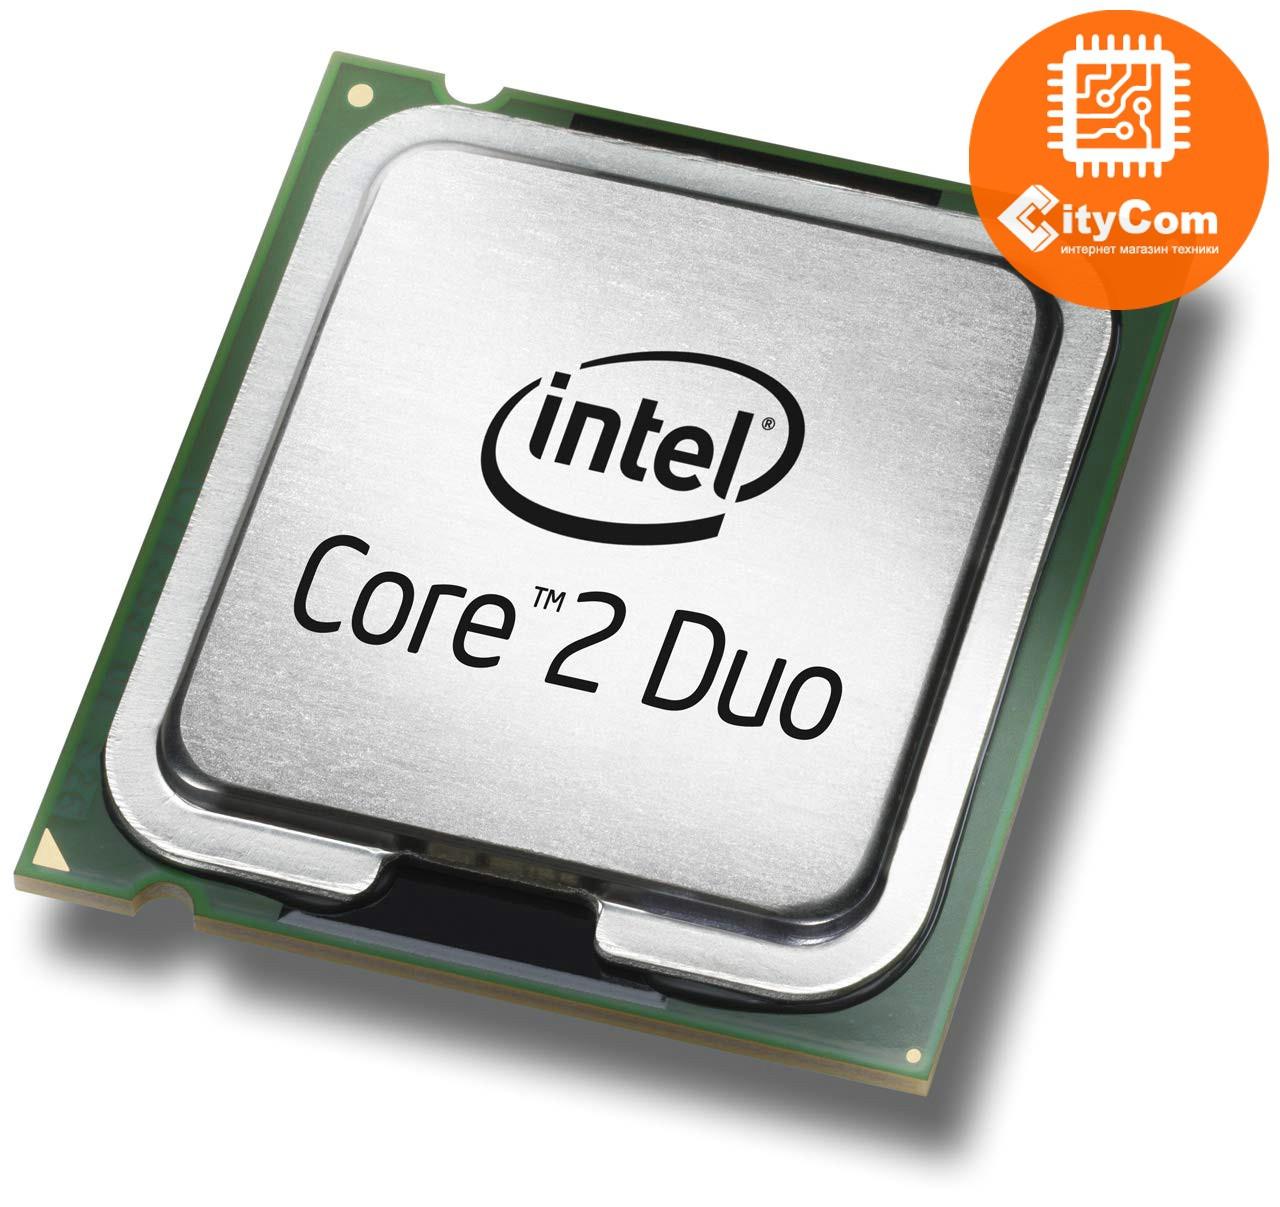 CPU S-775 Intel Core2Duo E8400 3.0 GHz (6MB, 1333 MHz, LGA775) oem Арт.1370